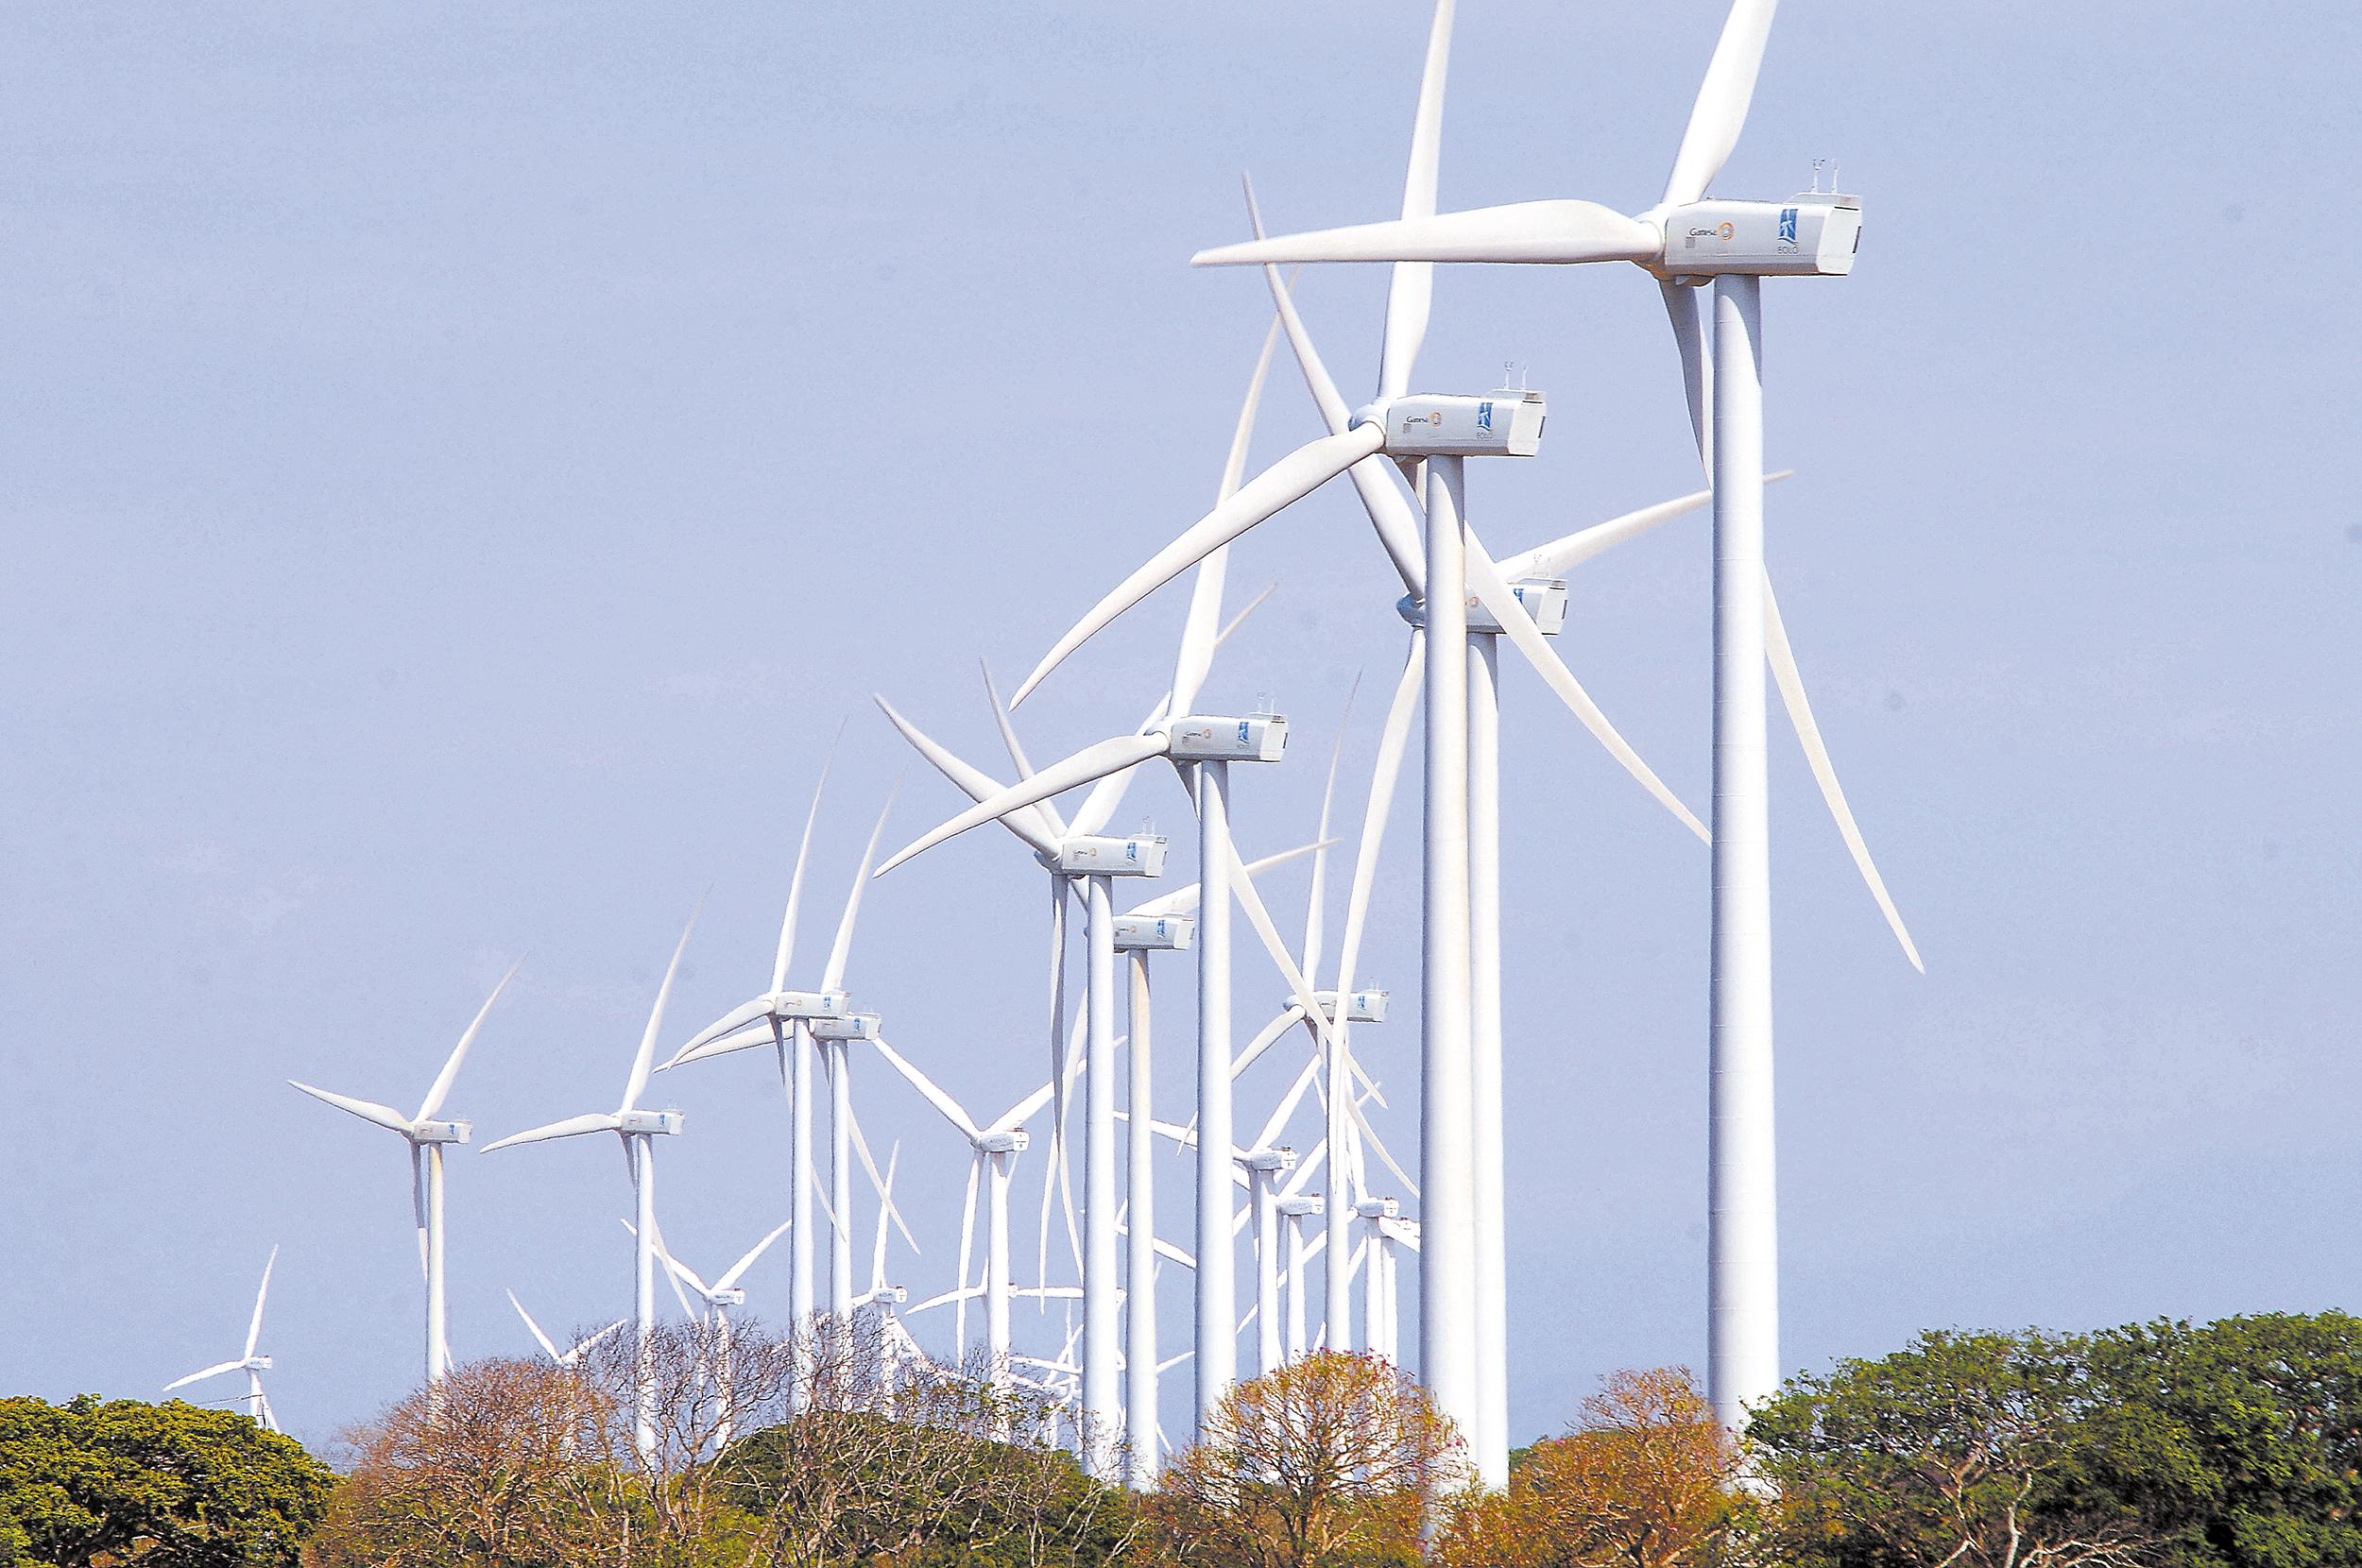 Gobierno nicaragüense emite normativa sin consenso con empresas eólicas